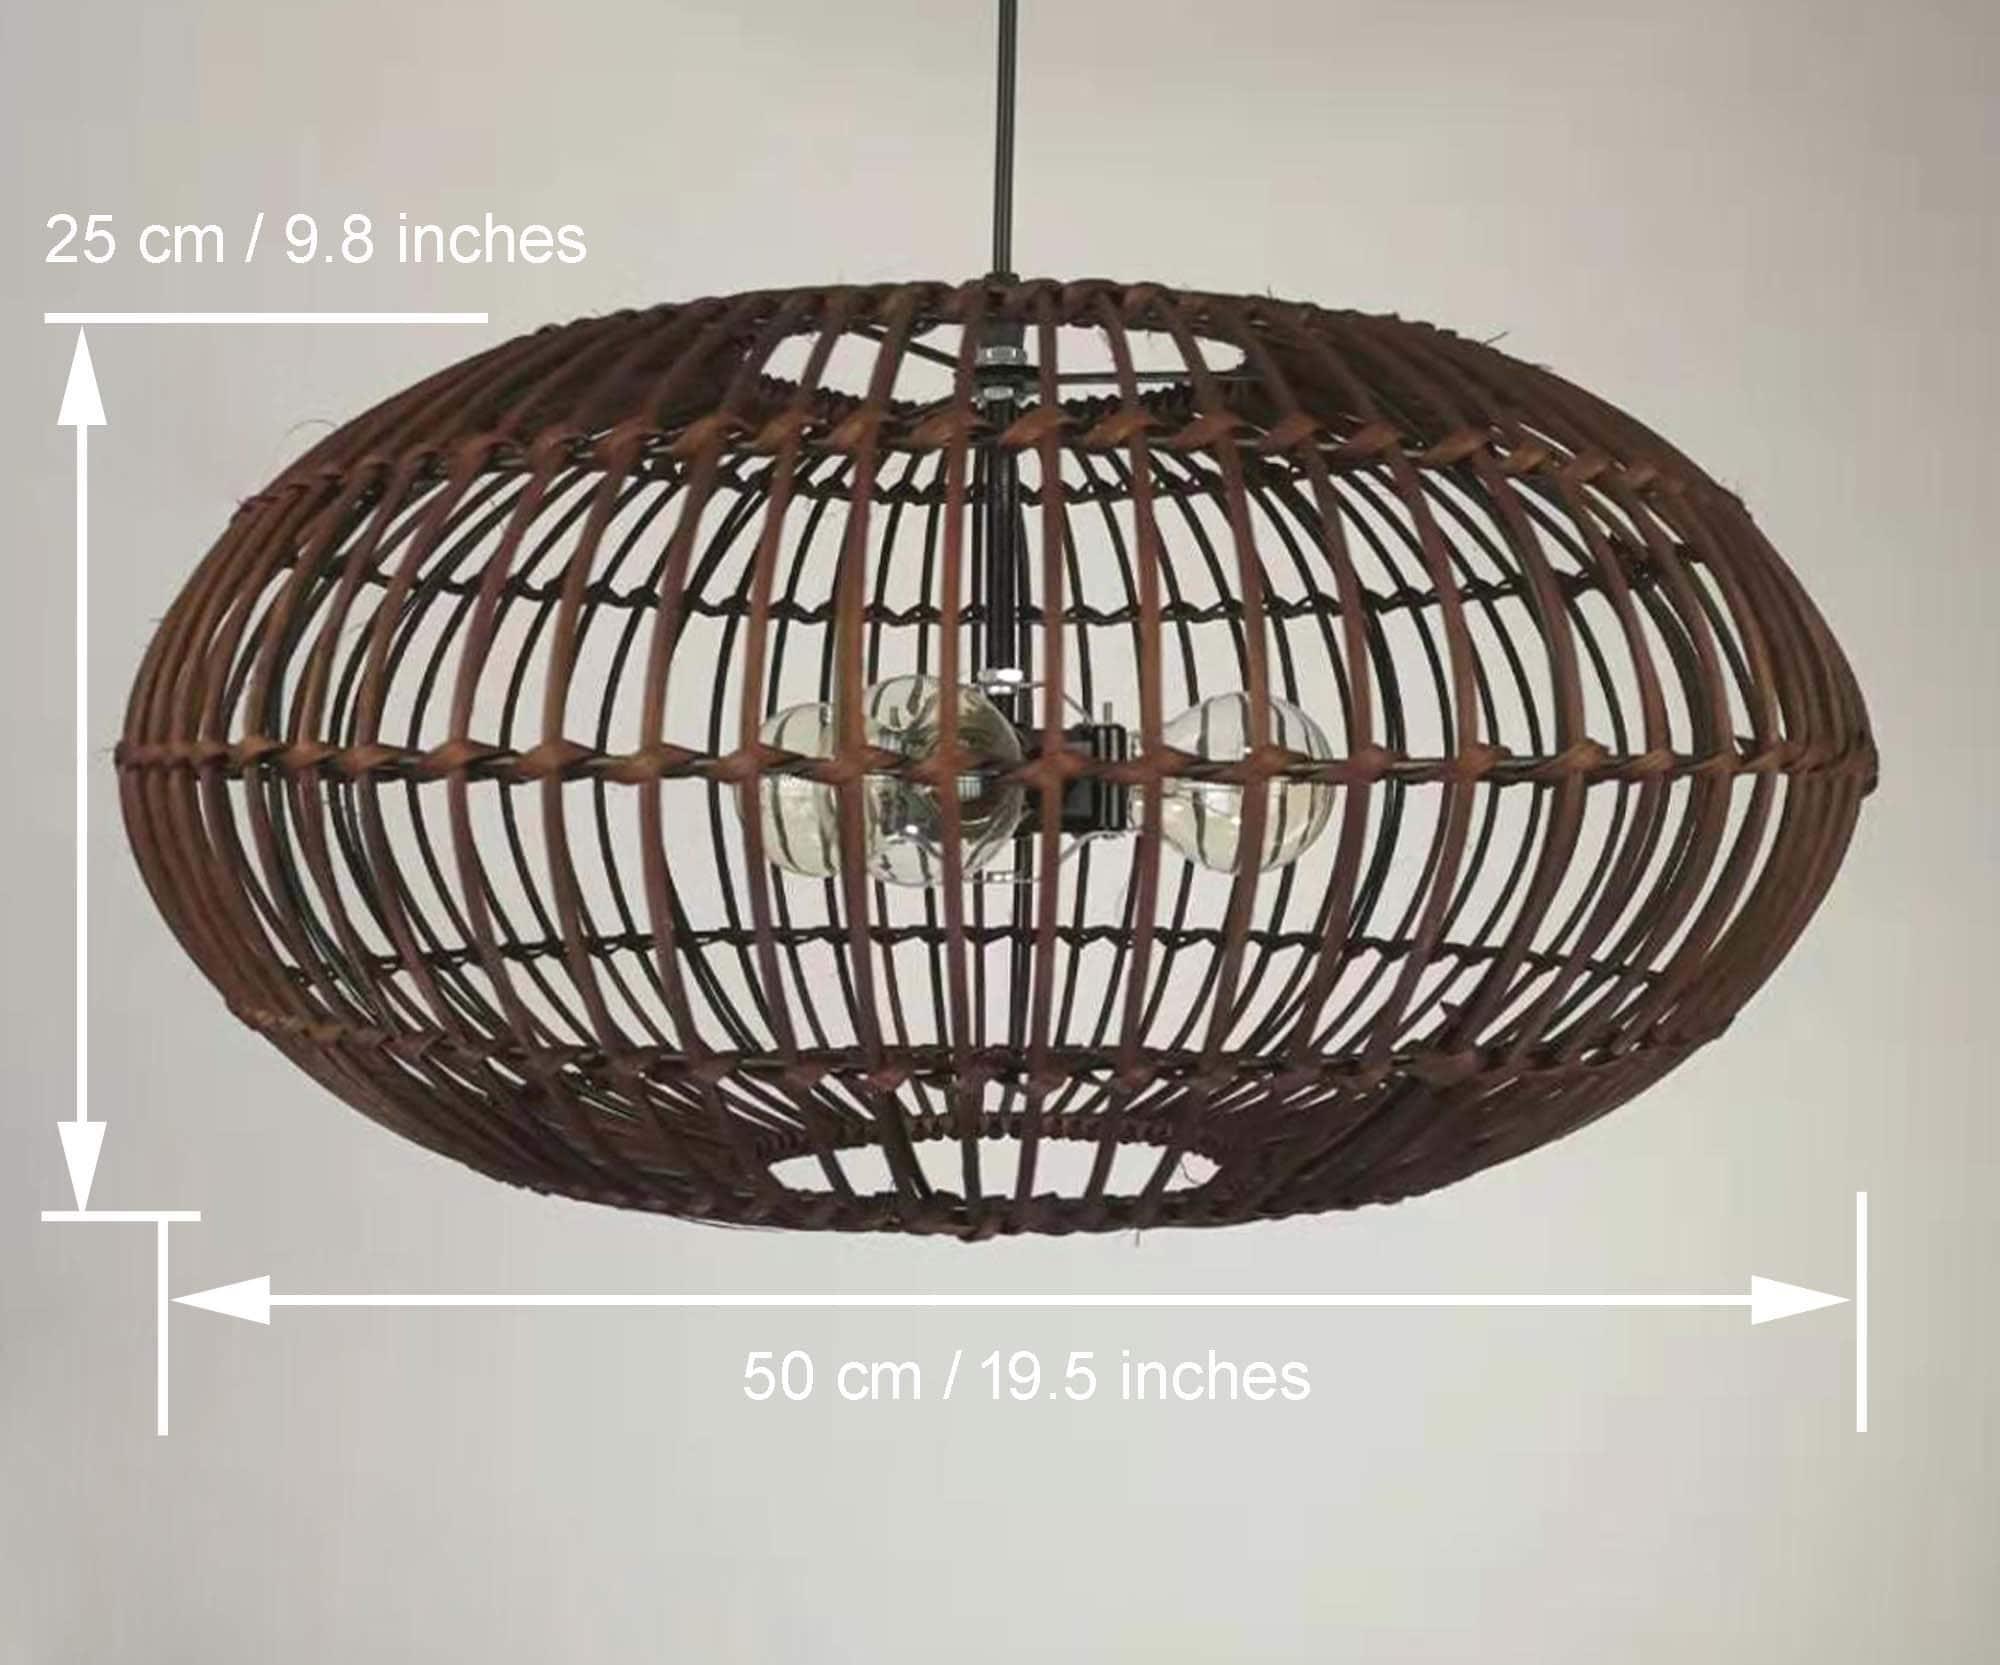 Oval Rattan Pendant Light  Brown / Black / Natural Rattan